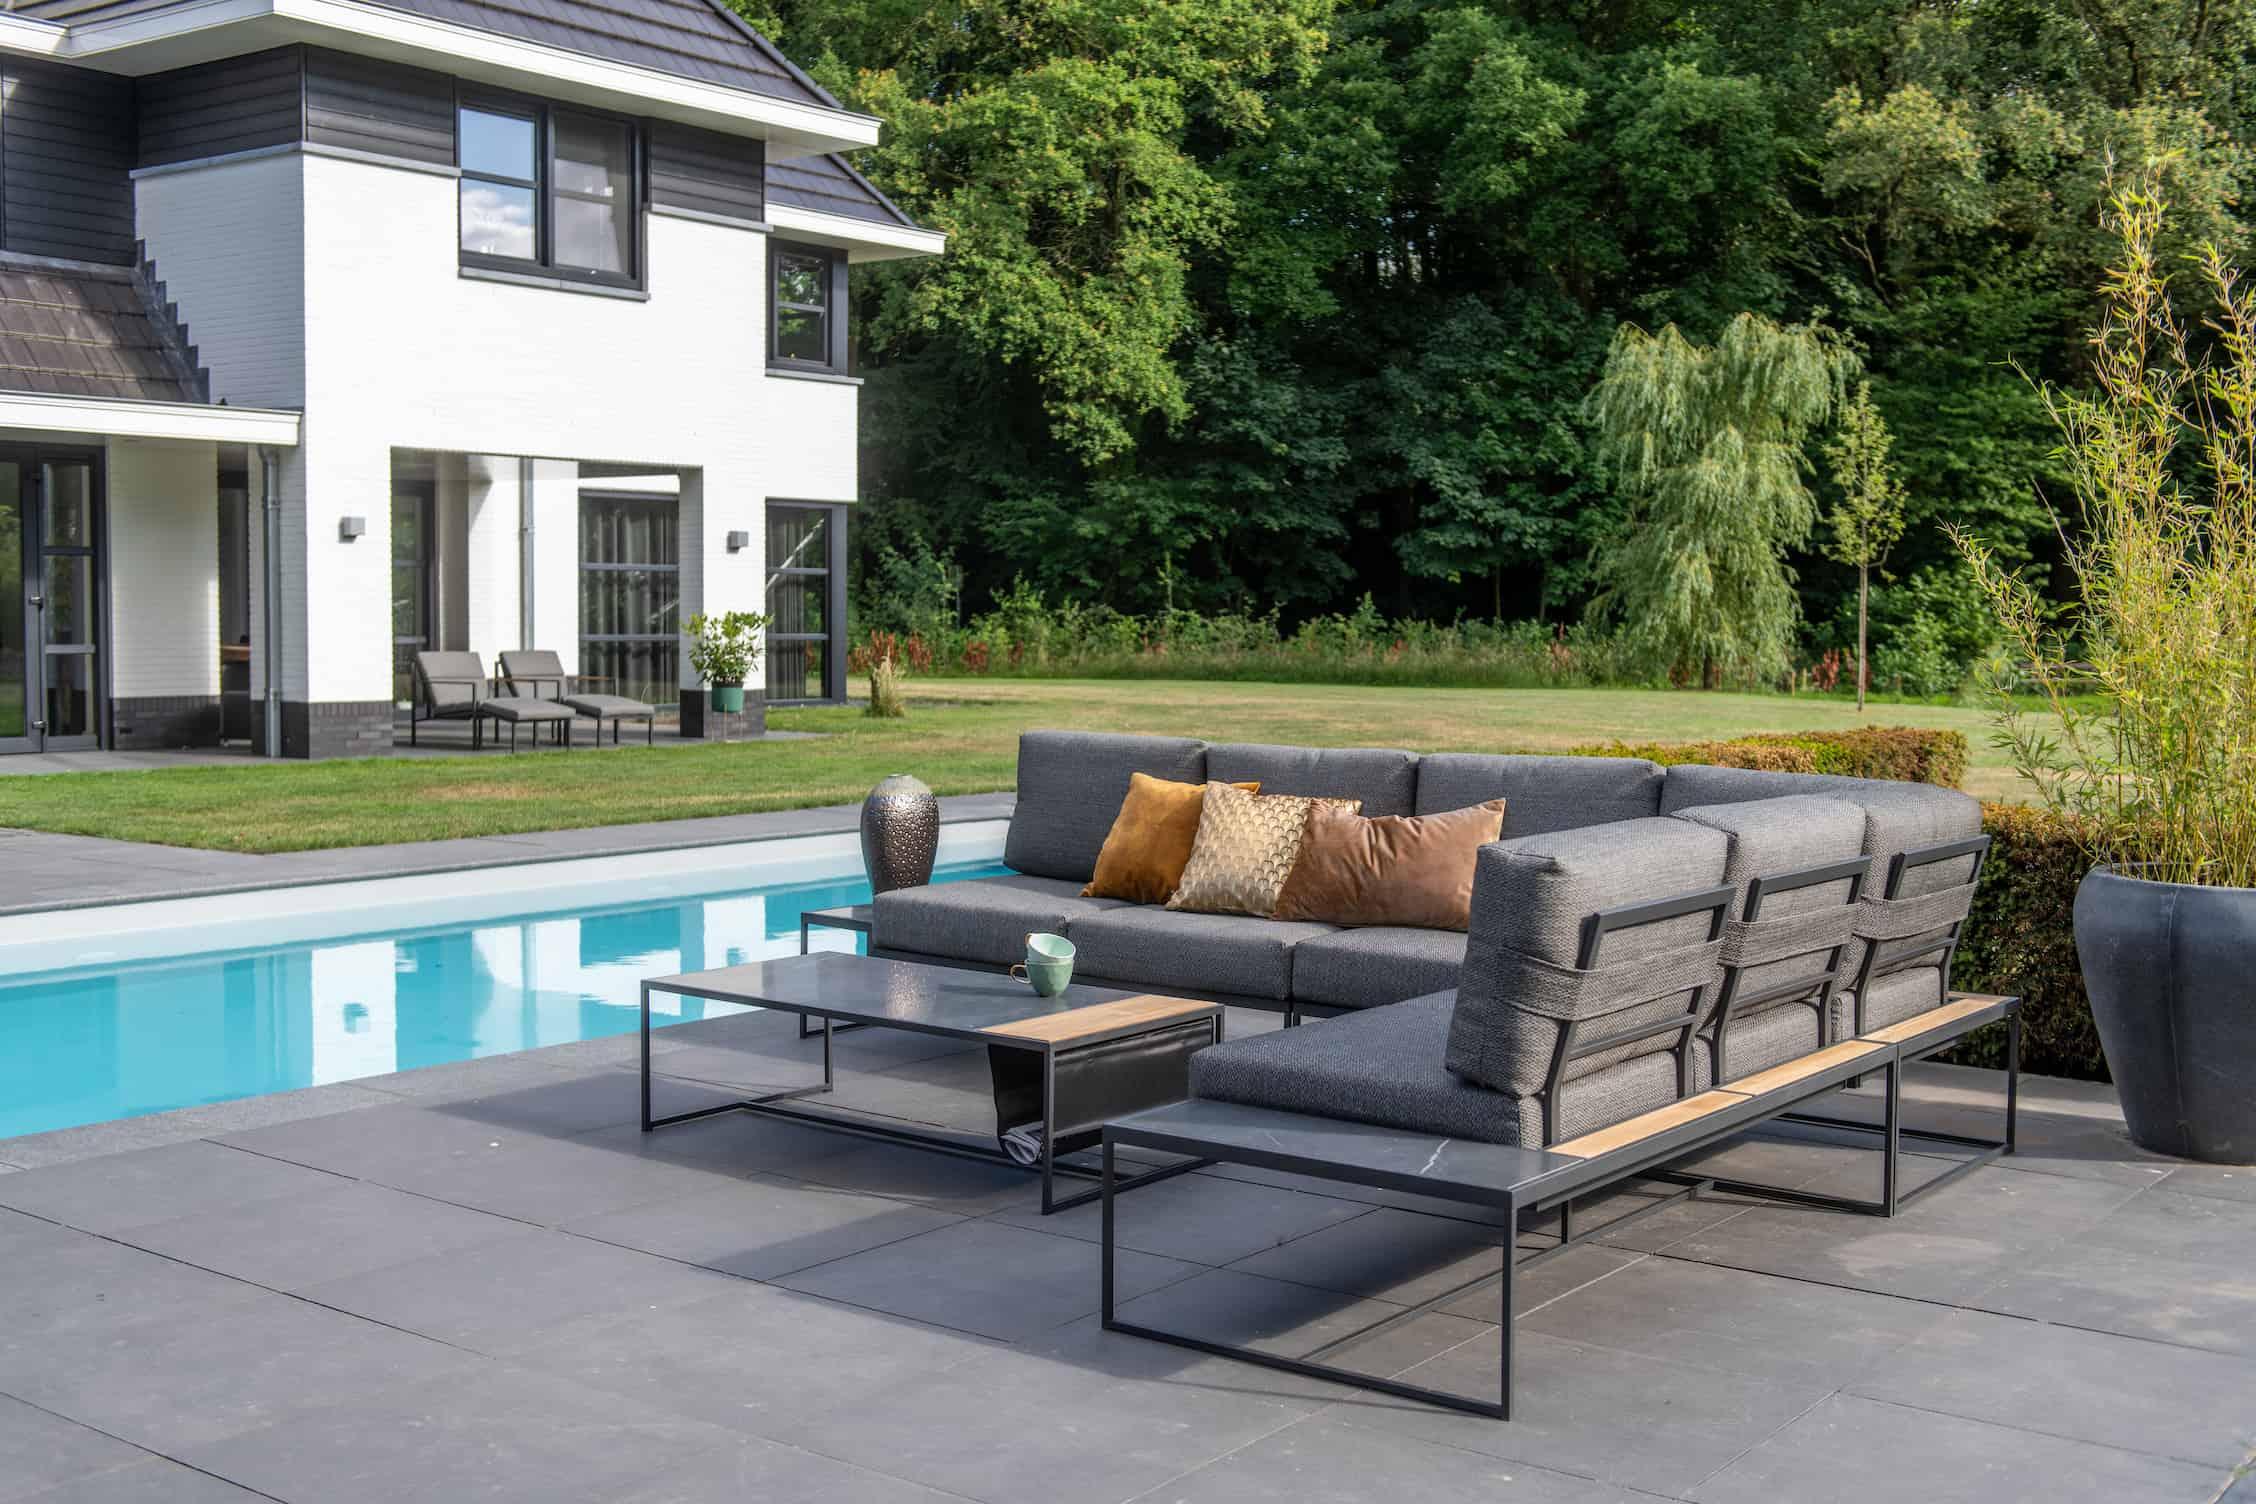 Siena Outdoor Furniture Set - Outdoor Furniture For Sale Dublin Ireland